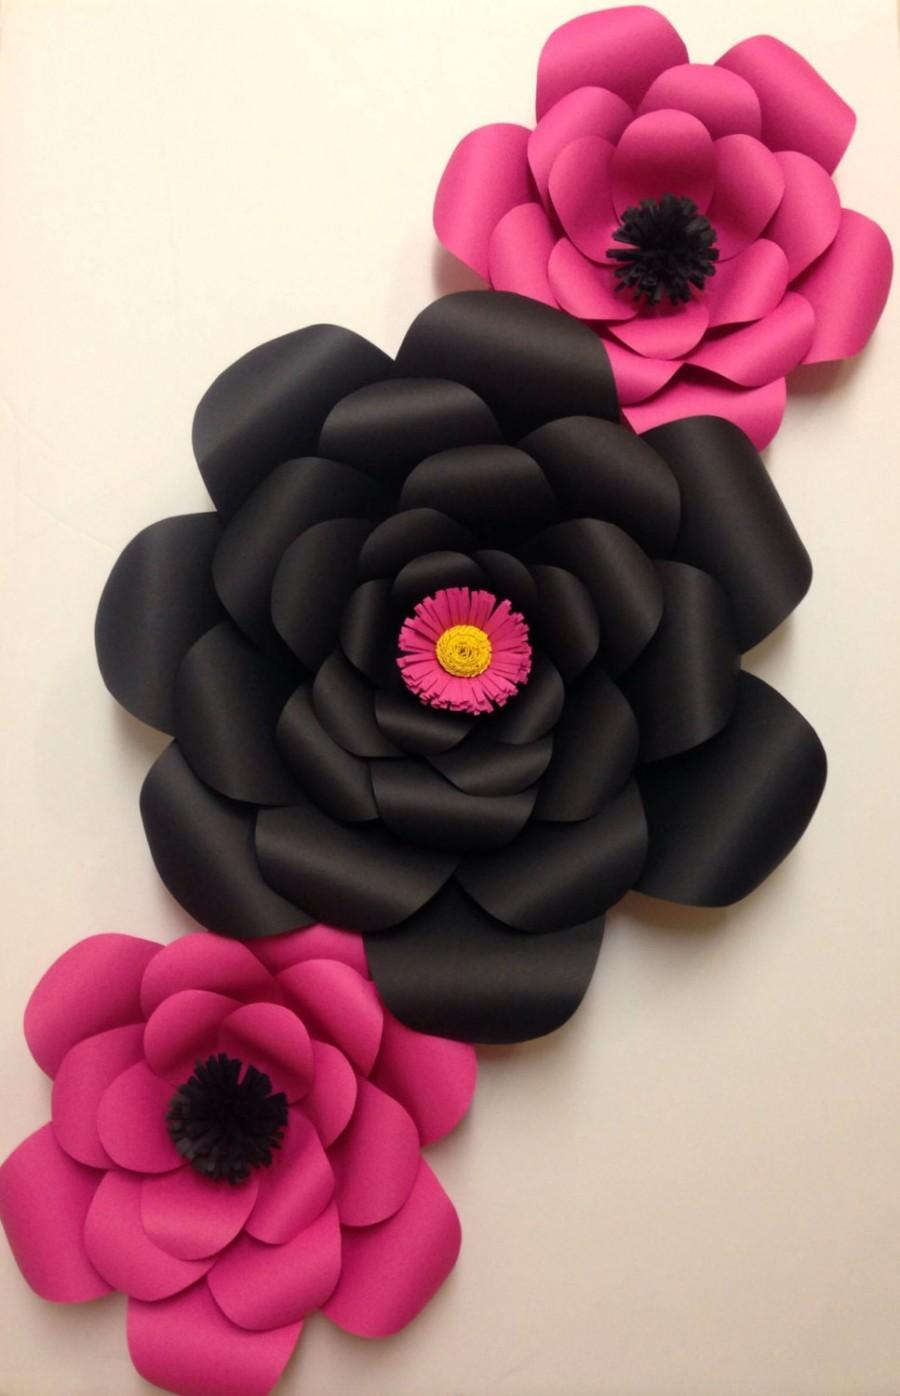 Mariage - Kate Spade Inspired Paper Flower Set - Kate Spade, bridal shower, bachelorette party, room decor